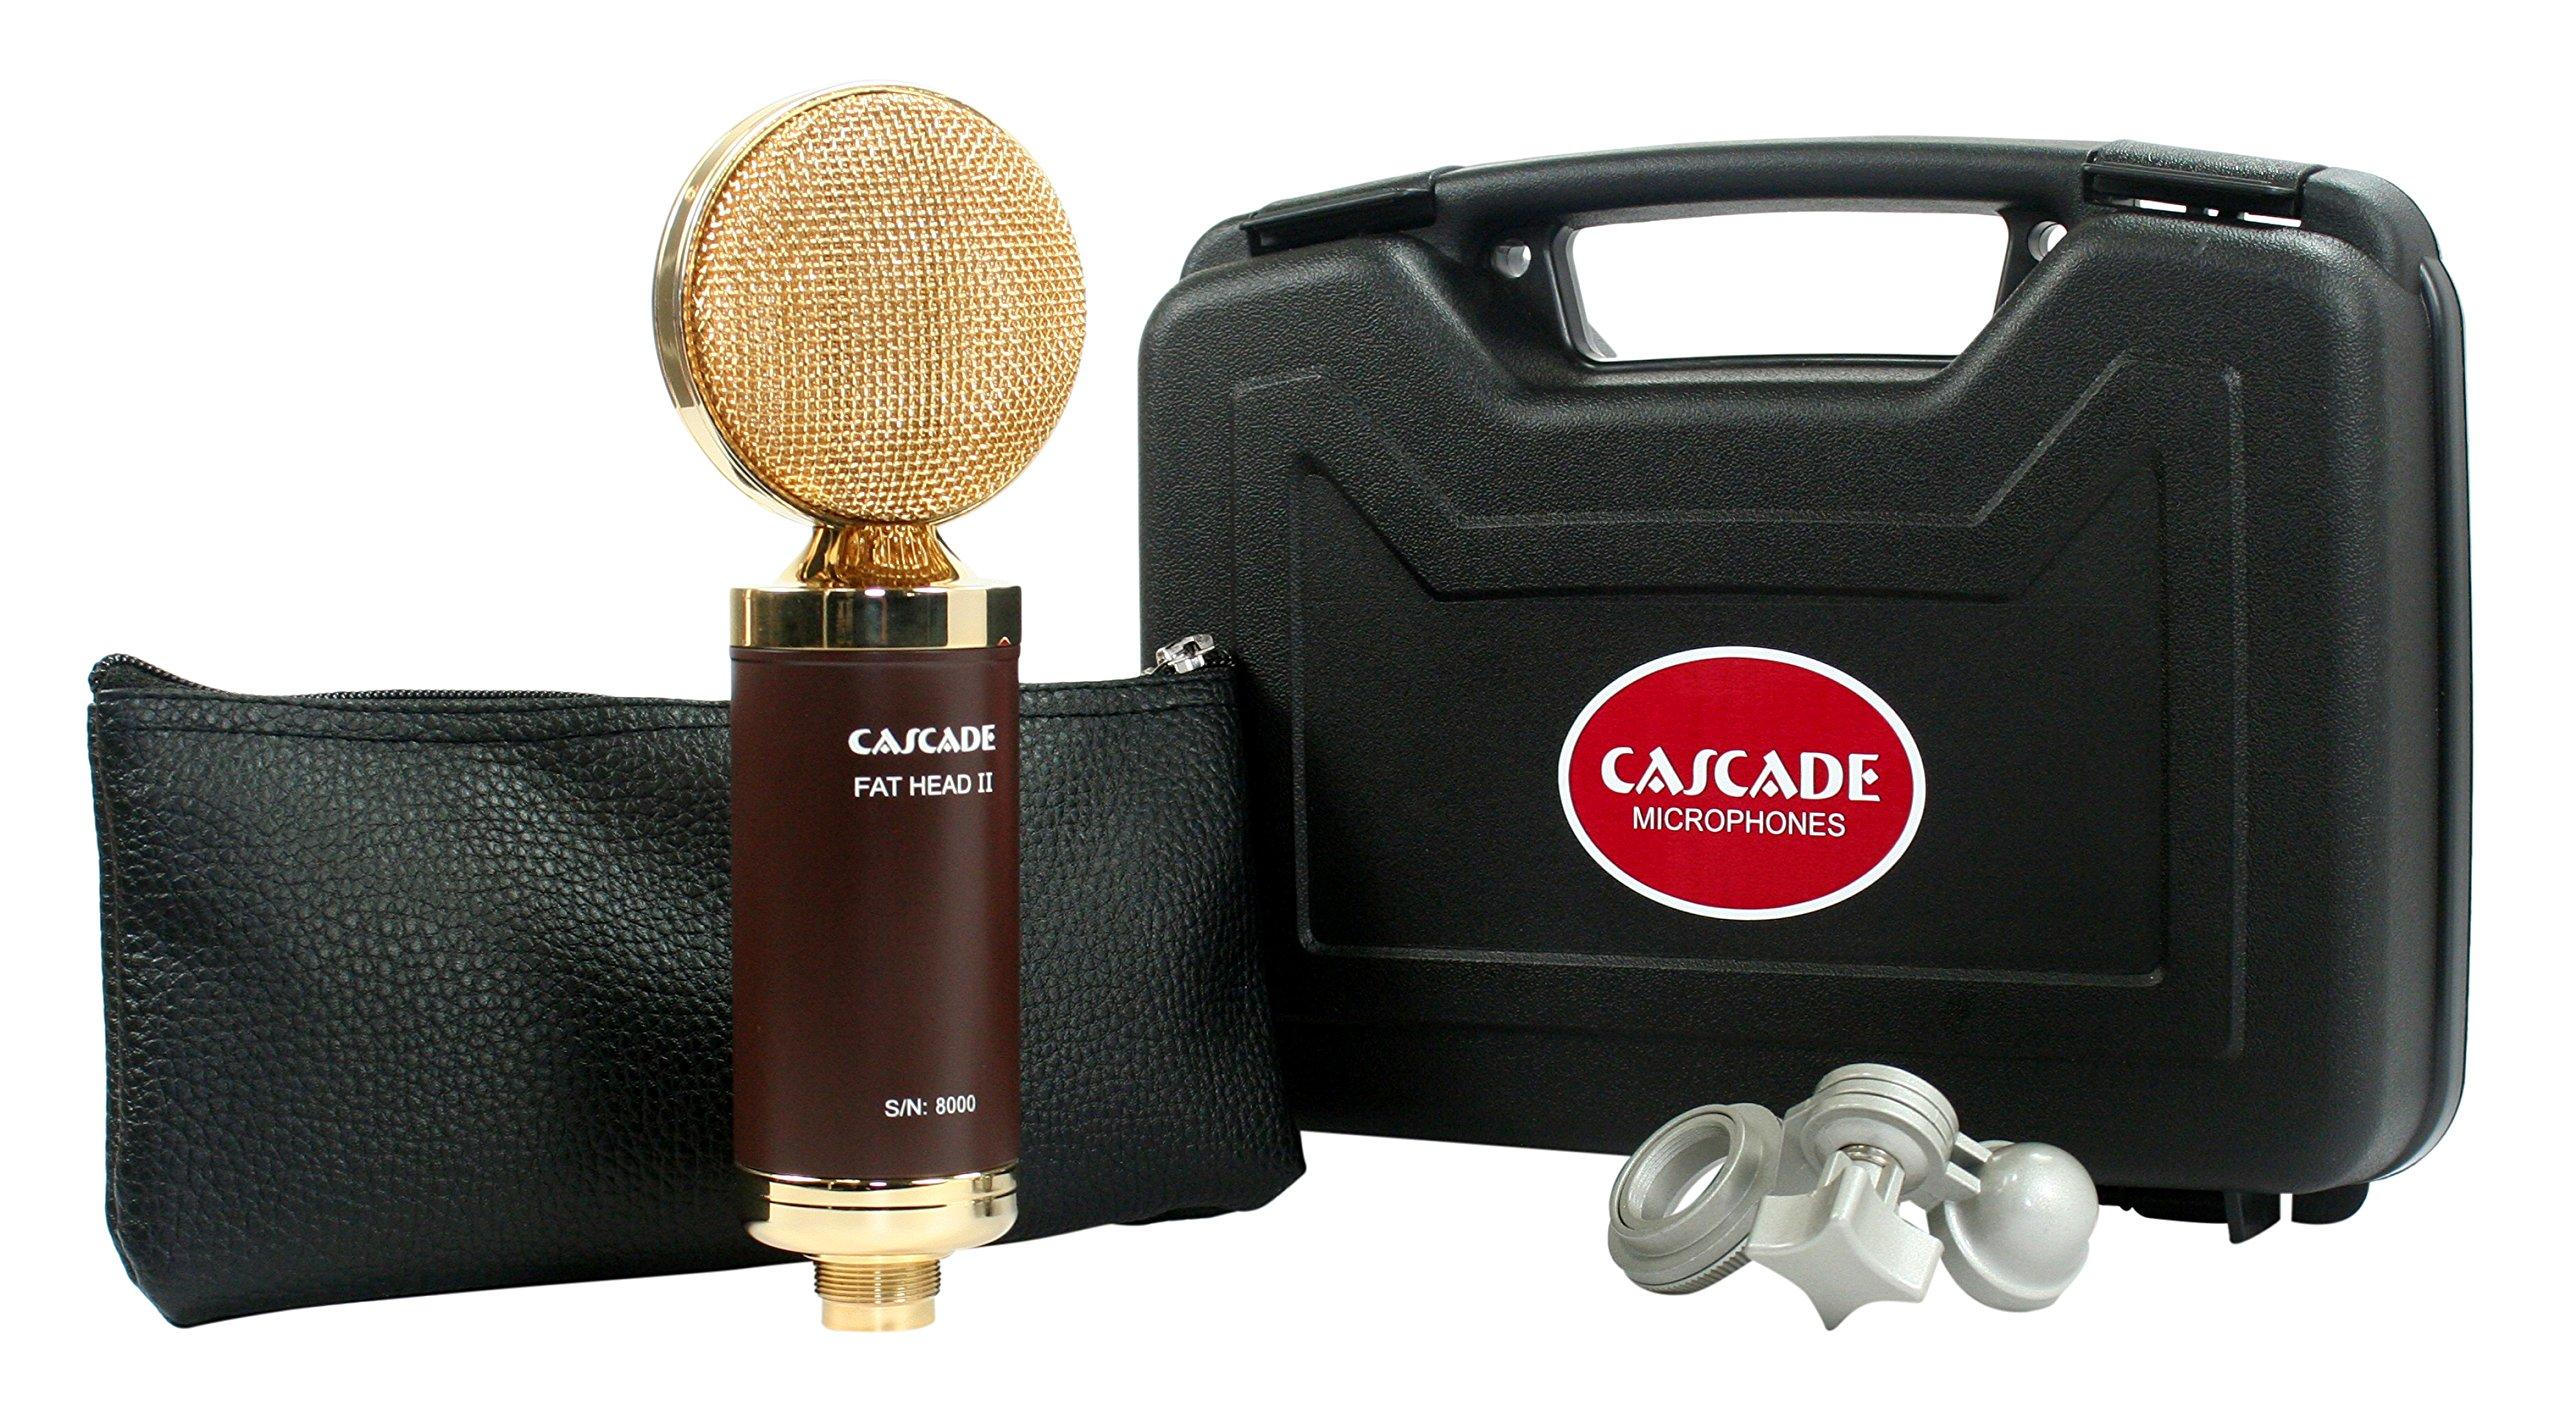 Cascade Microphones 99-GL-A Ribbon Microphone